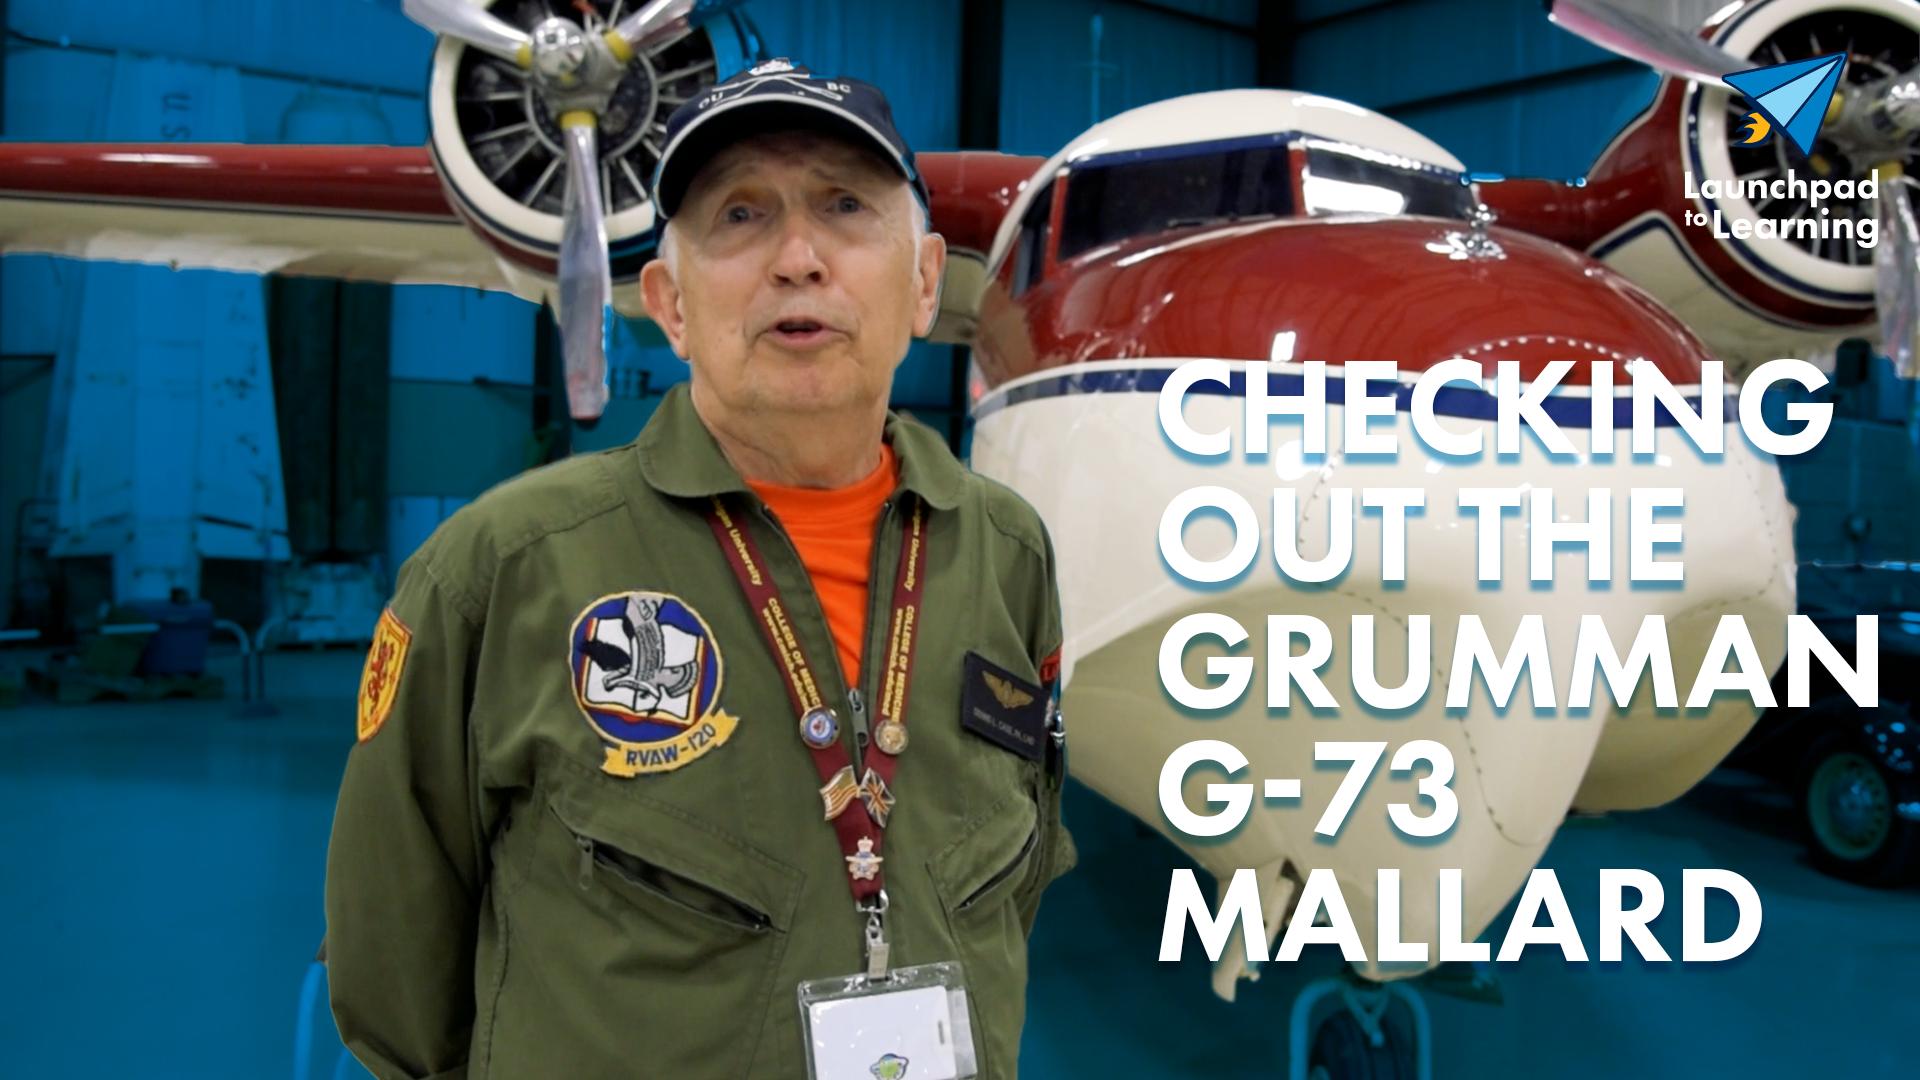 Checking out the Grumman Mallard image